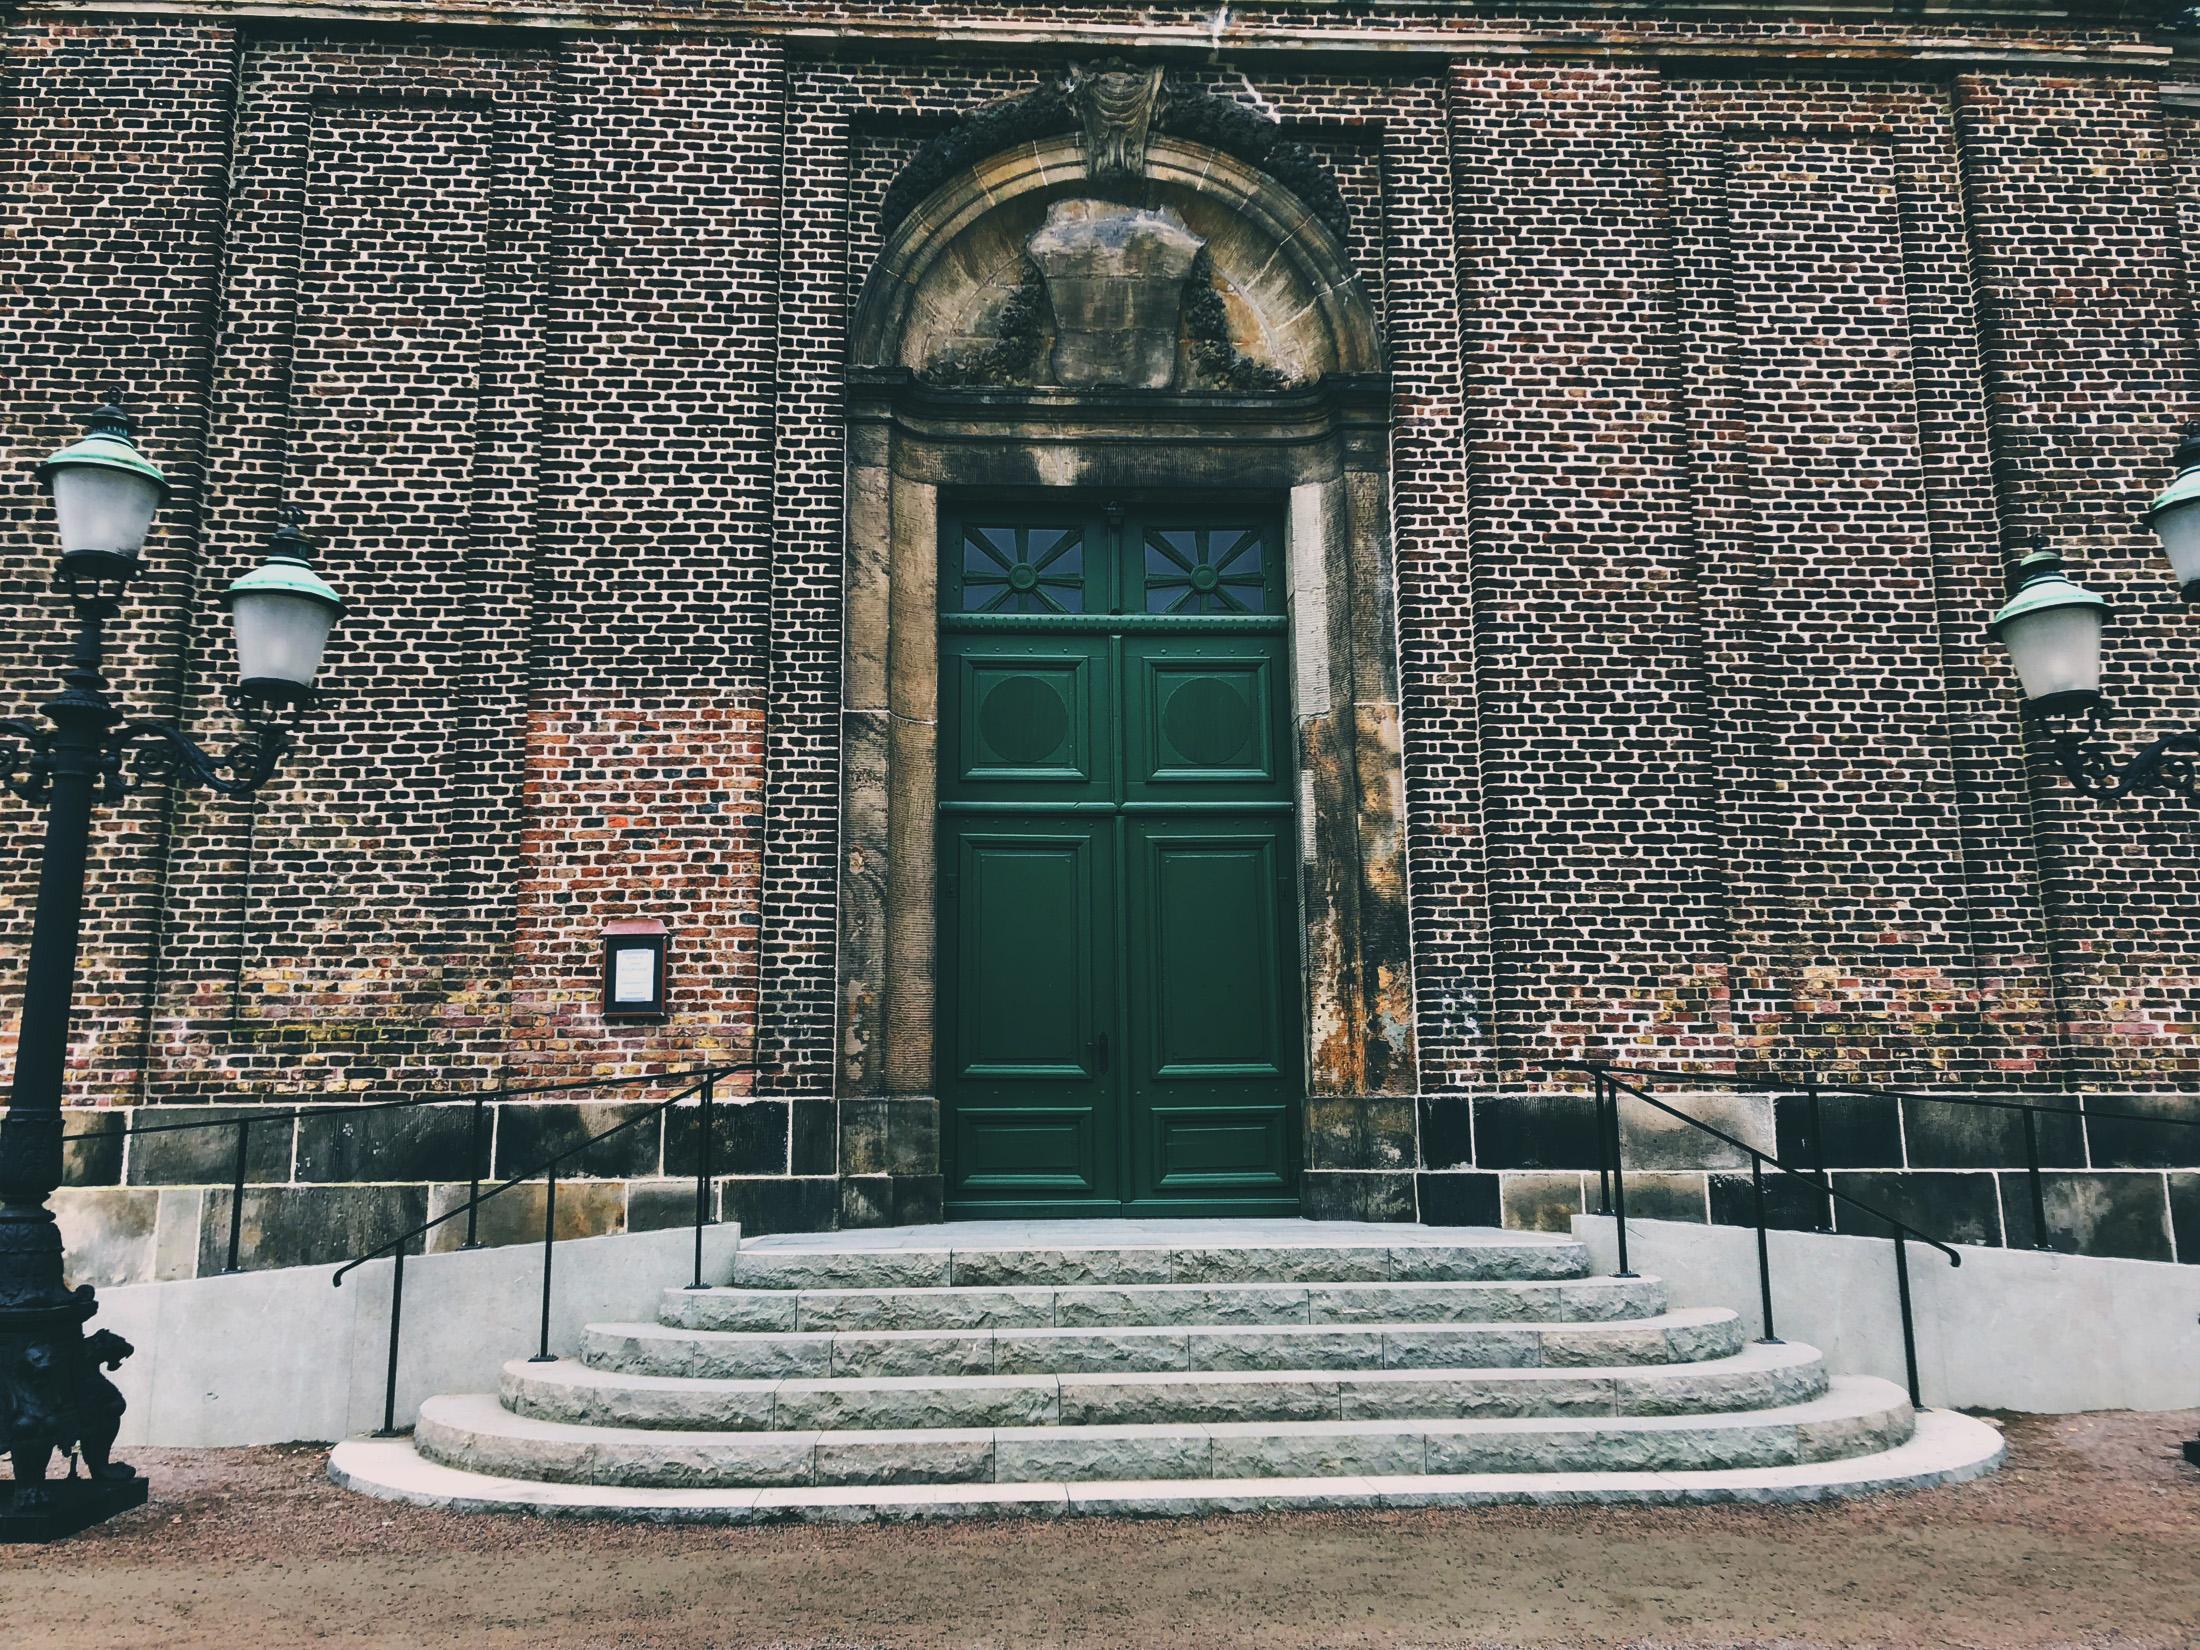 Sofia Albertina kyrka